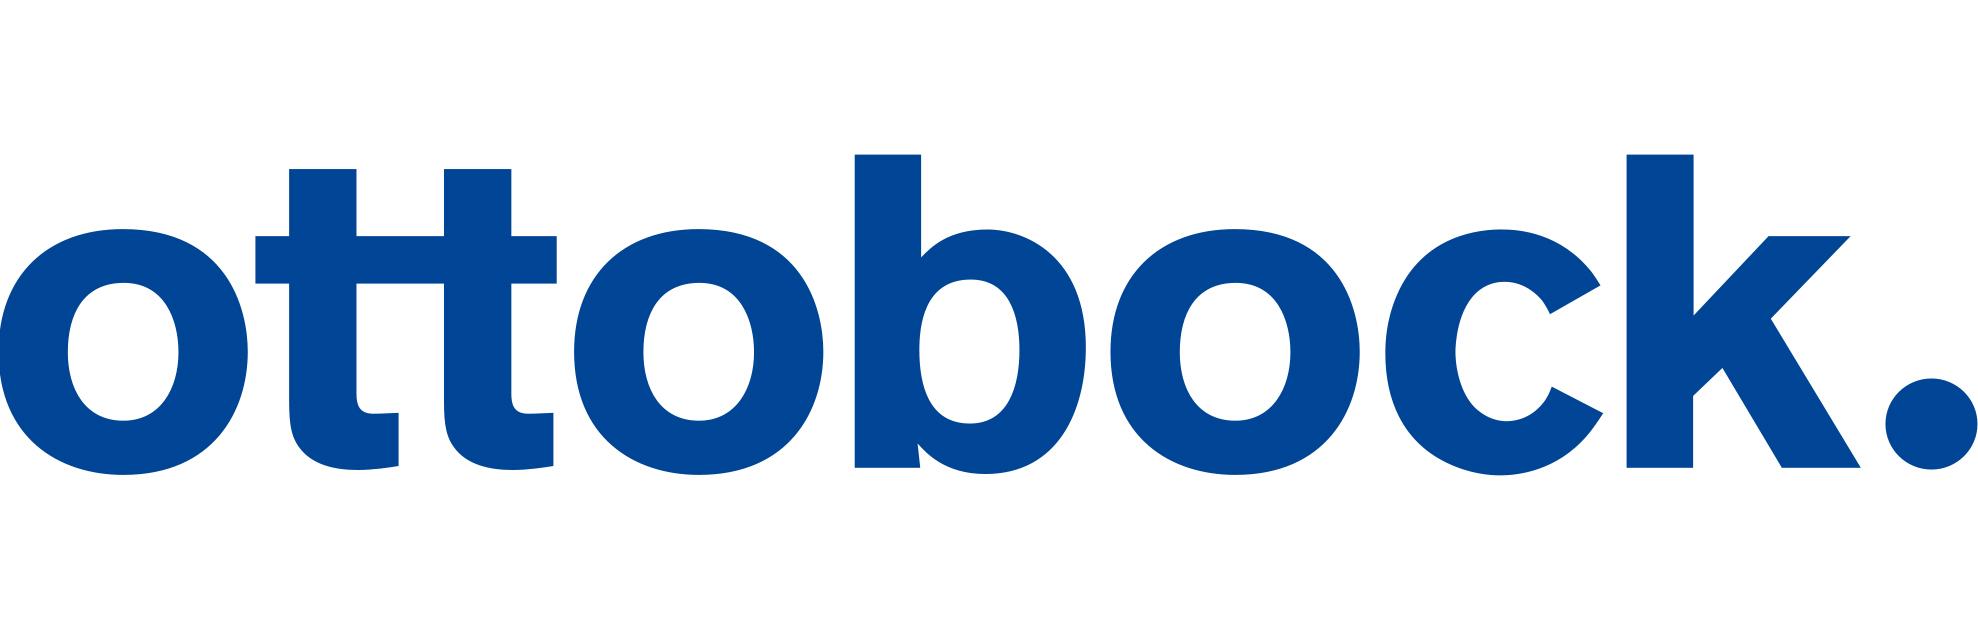 Logo: ottobock